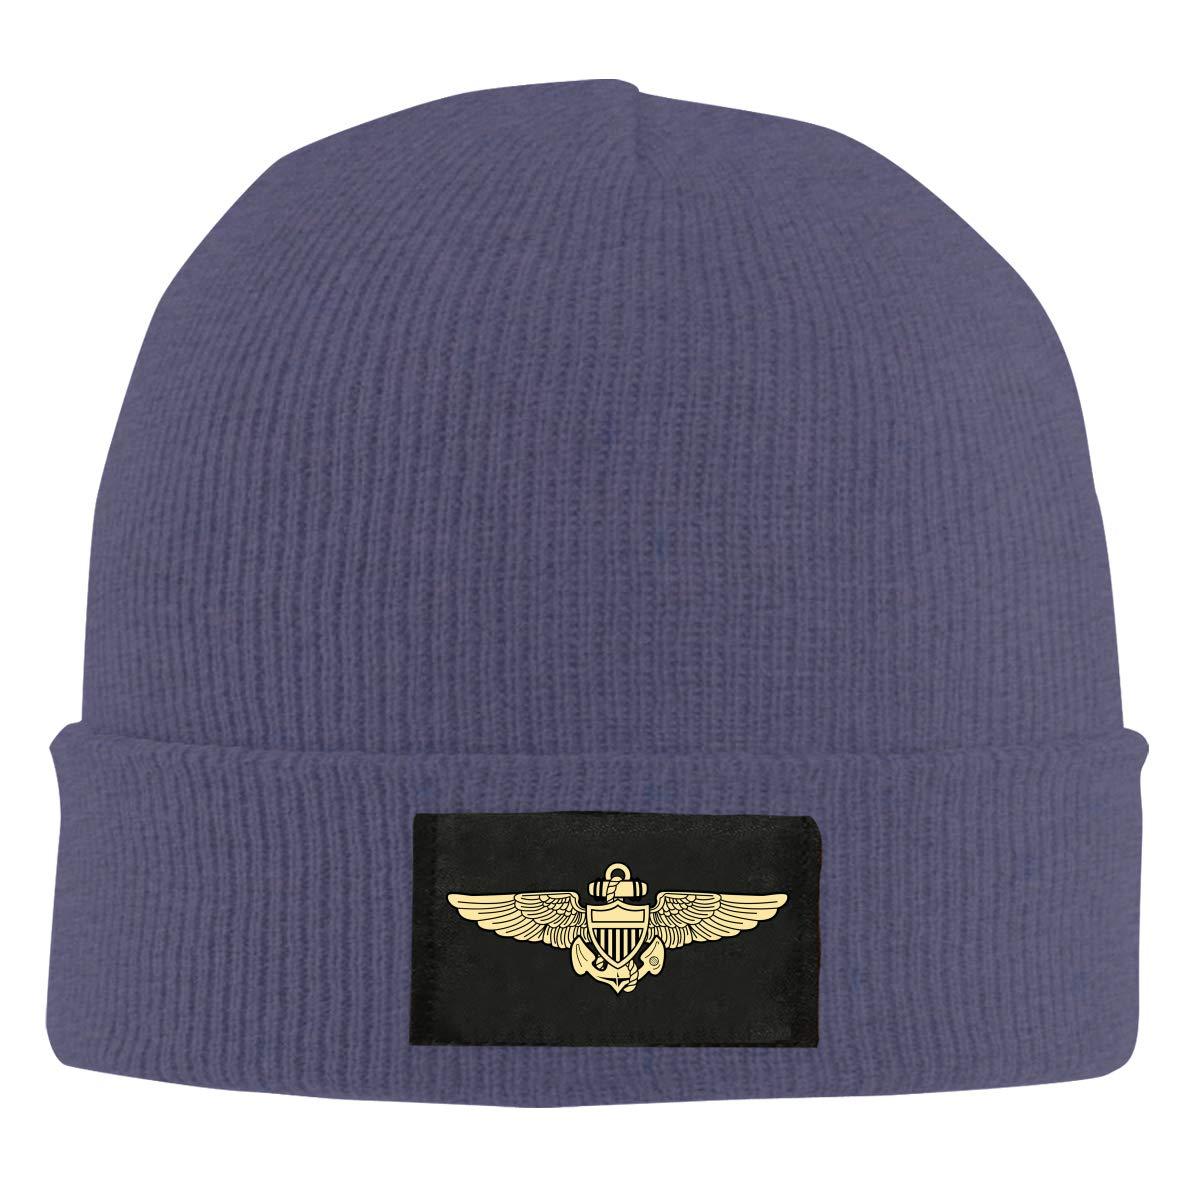 Naval Aviator Pilot Wings Unisex Warm Winter Hat Knit Beanie Skull Cap Cuff Beanie Hat Winter Hats